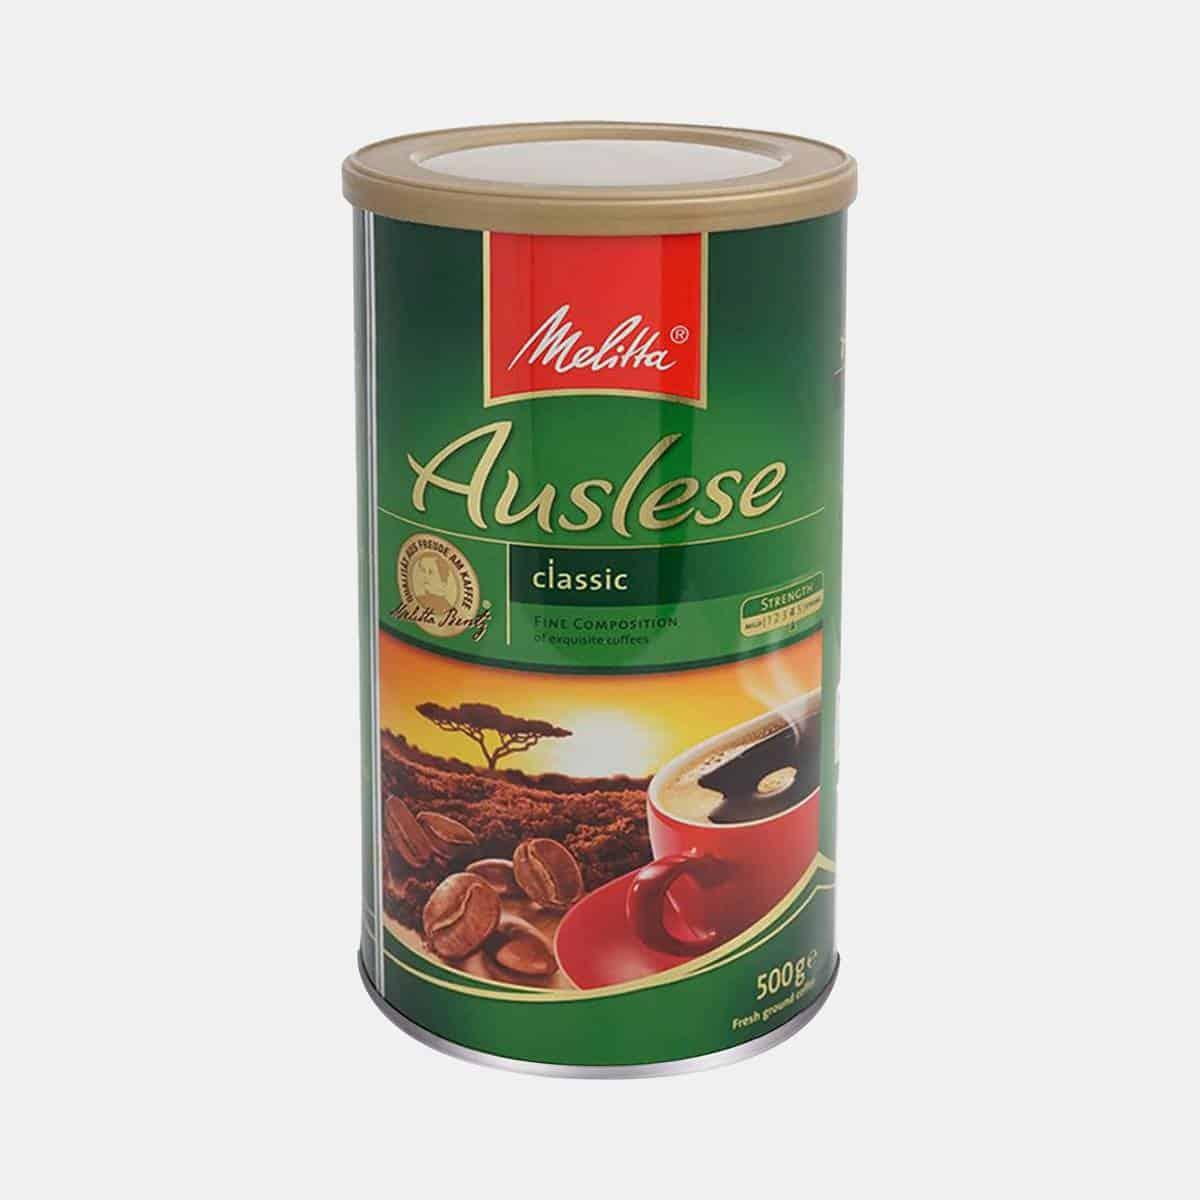 Melitta Auslese Coffee 500g Tin